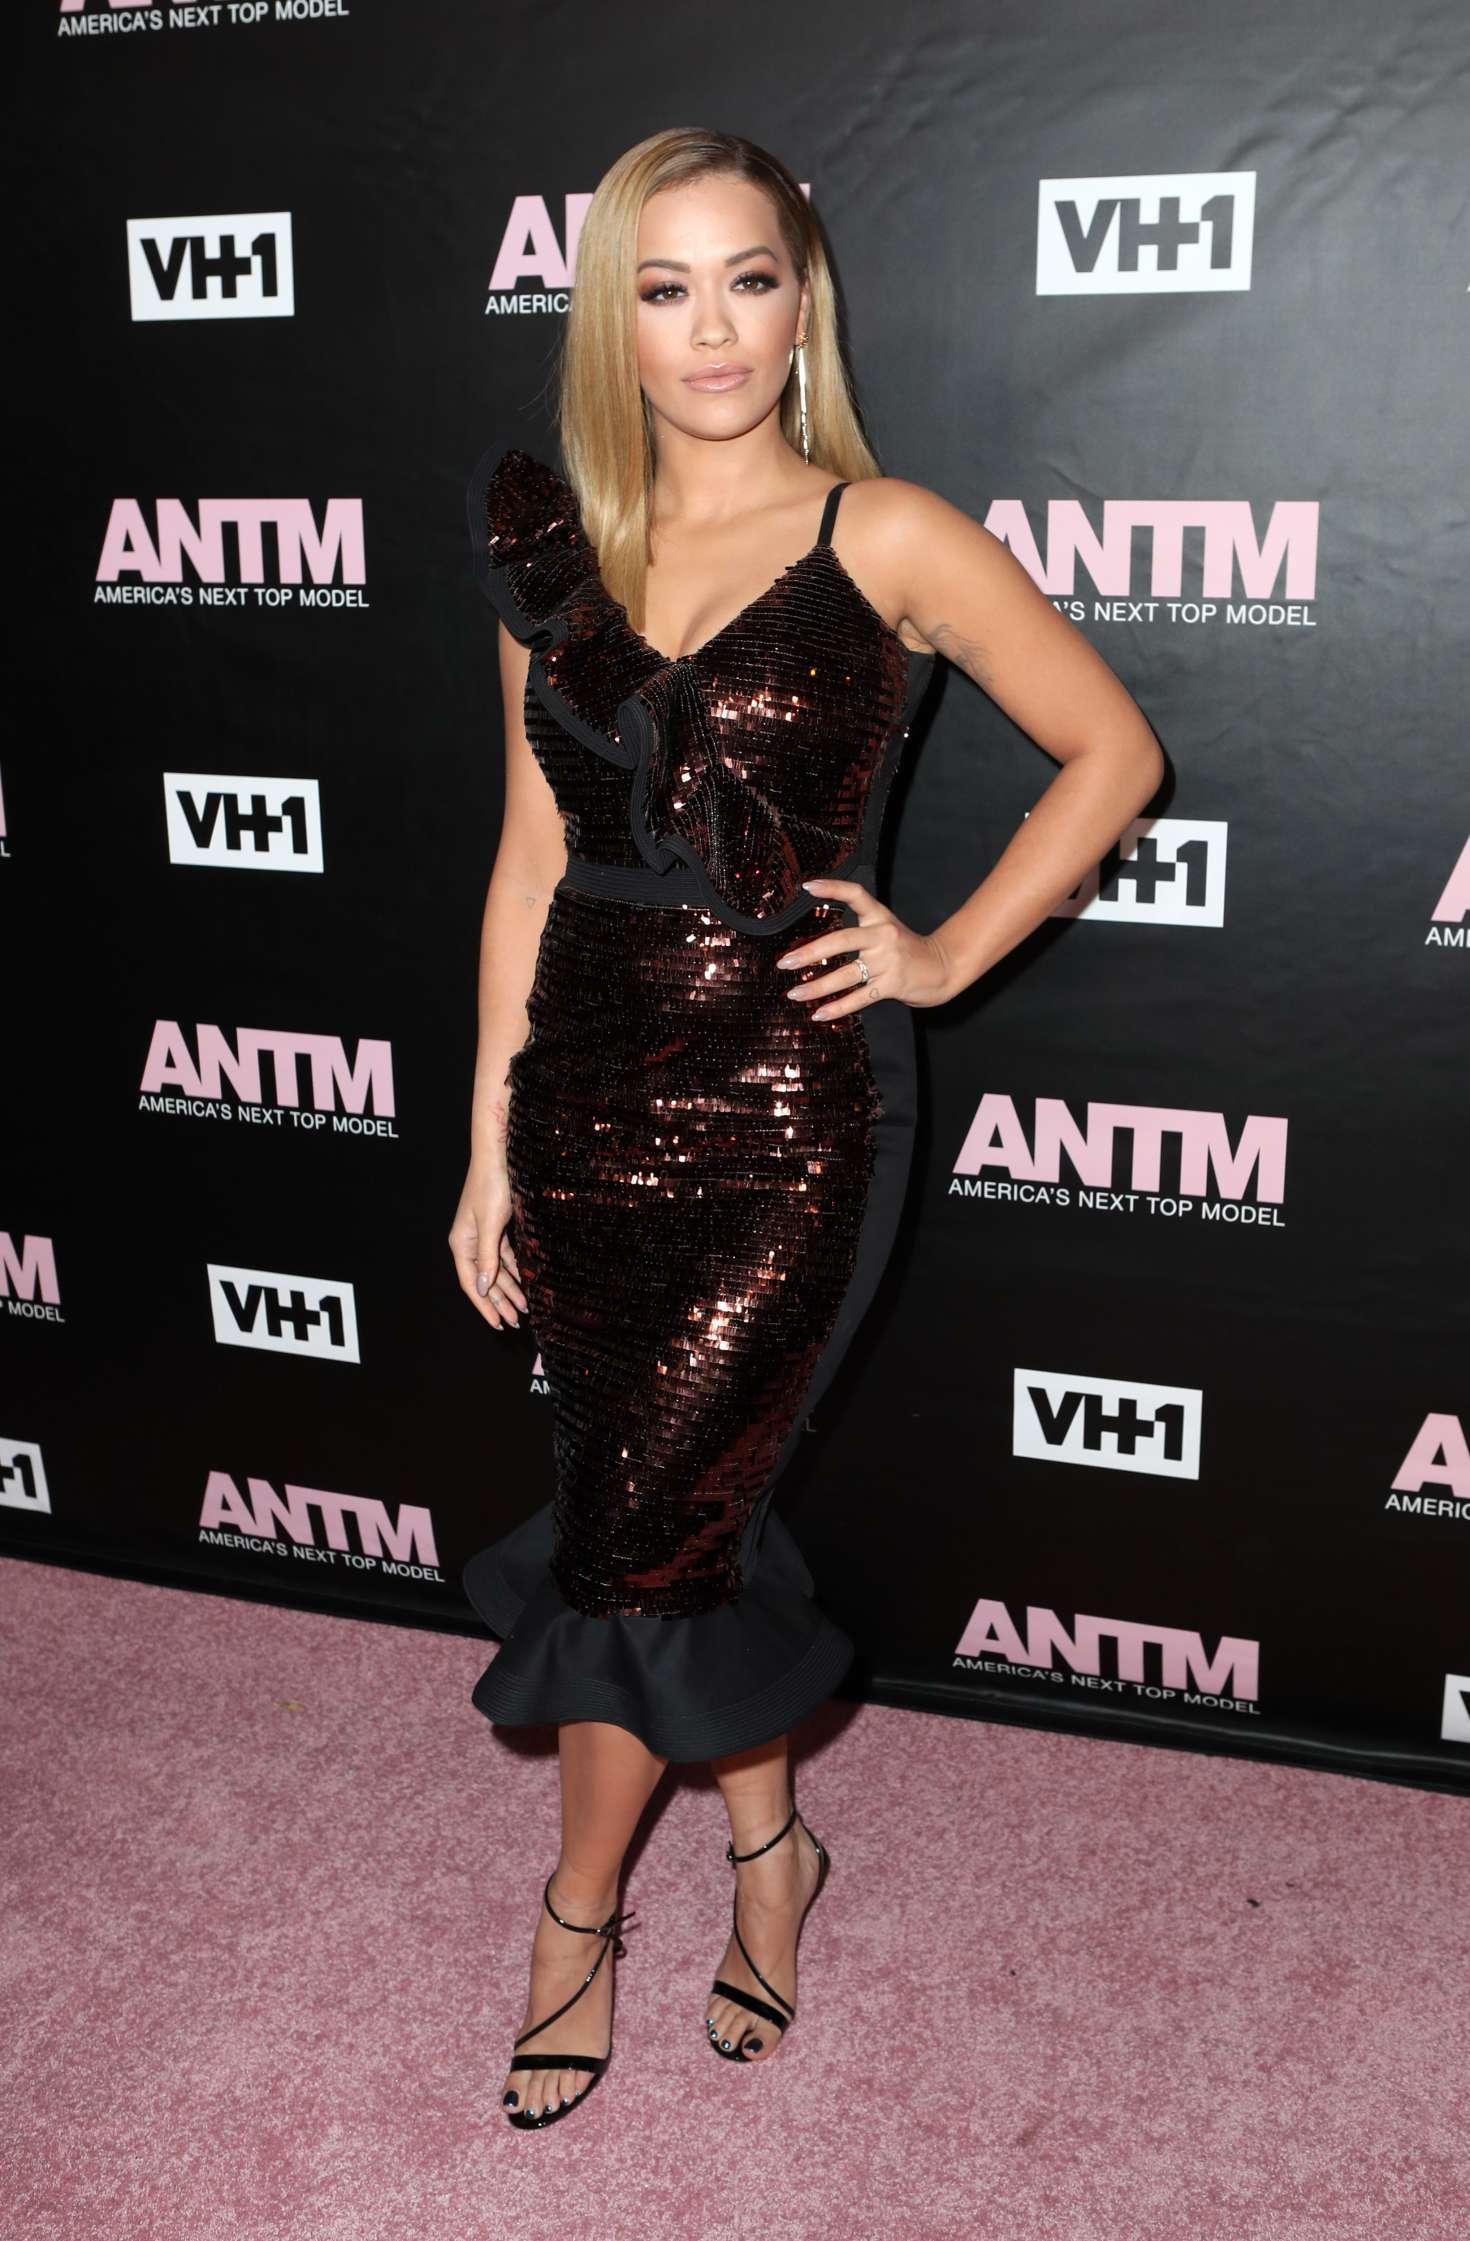 Rita Ora 2016 : Rita Ora: Americas Next Top Model Premiere Party -05